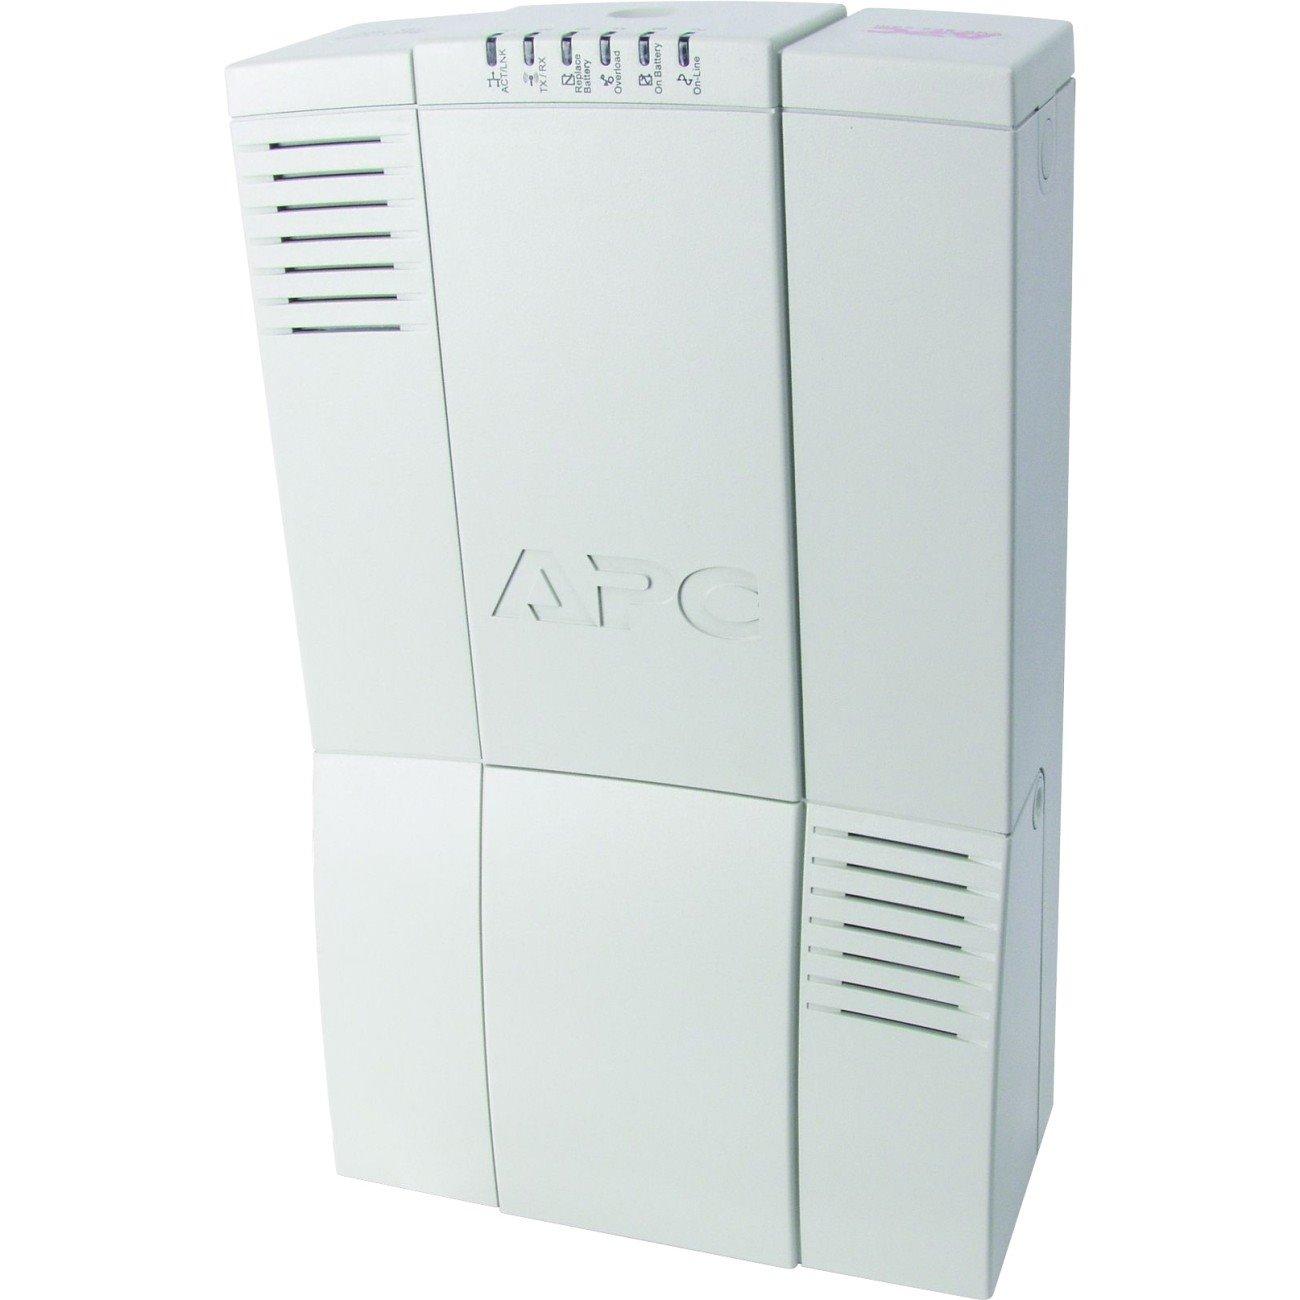 APC by Schneider Electric Back-UPS BH500INET Standby UPS - 500 VA/300 W